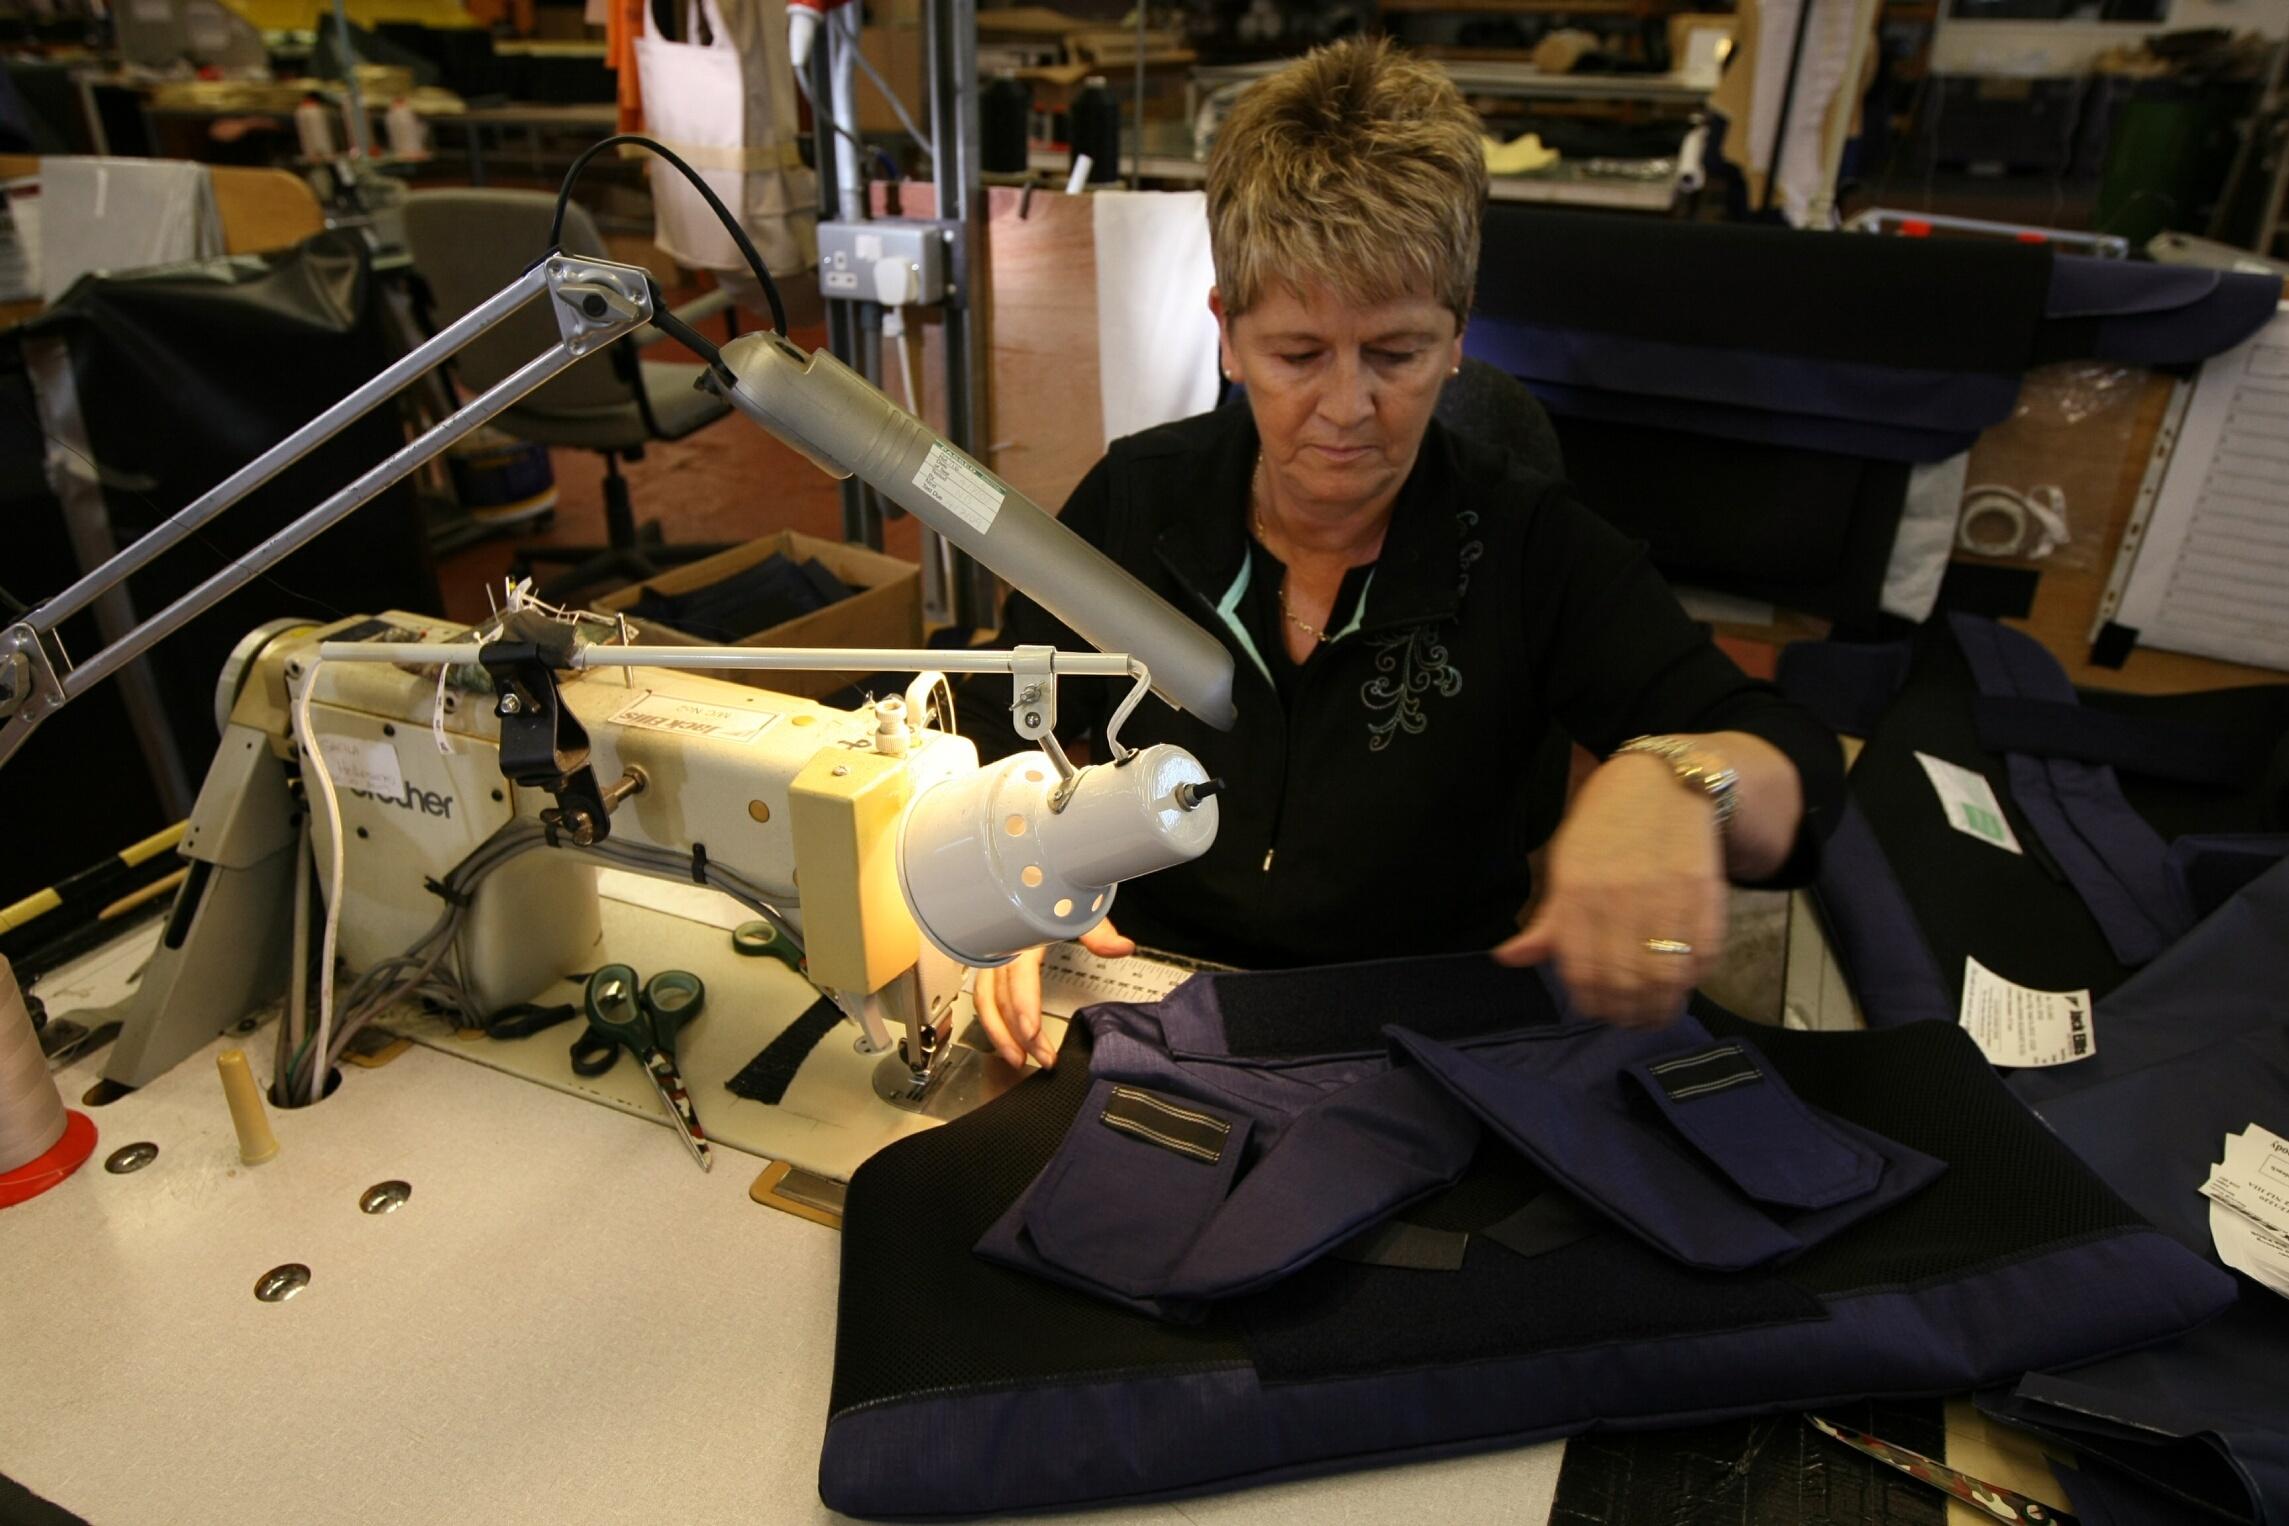 Making body protection vests at the Jack Ellis facility in Kirriemuir